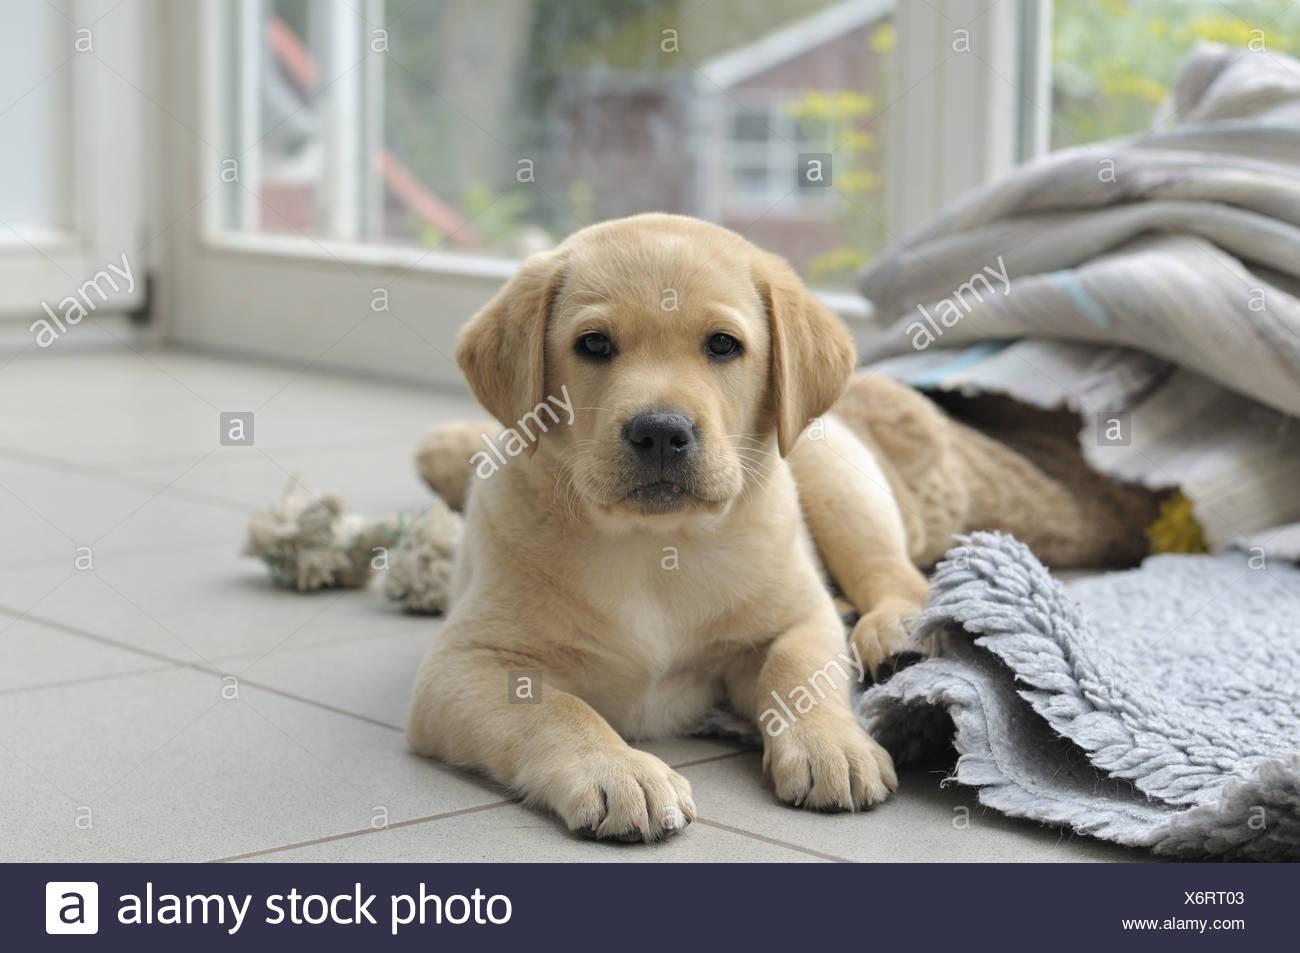 Blonde Labrador Retriever Lying On The Floor Puppy Stock Photo Alamy